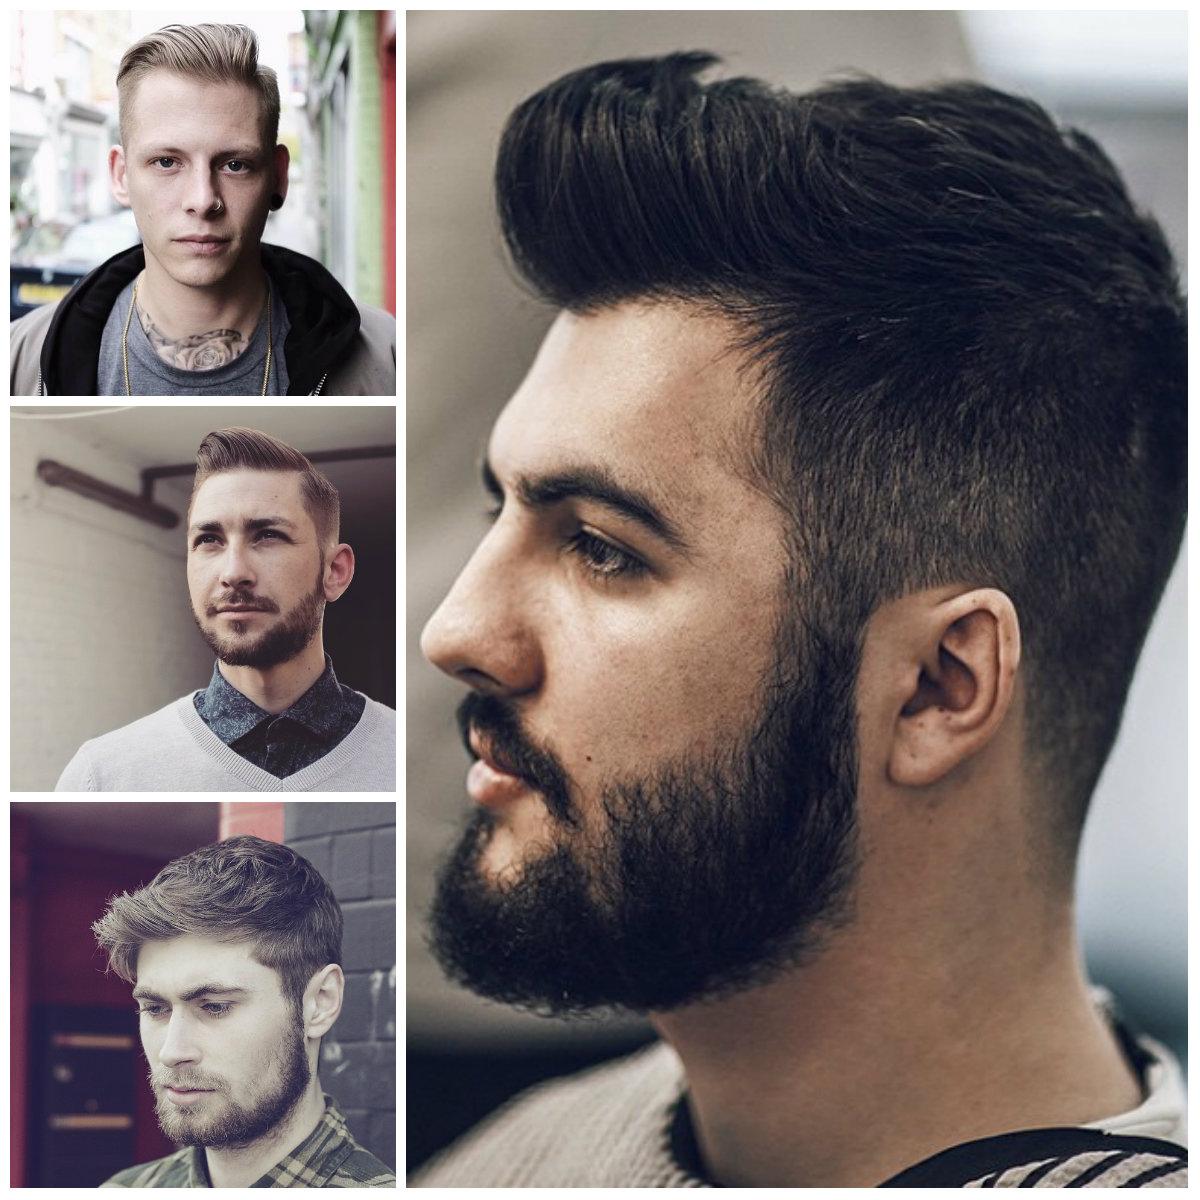 Trendiest Hairstyles for Men 2022